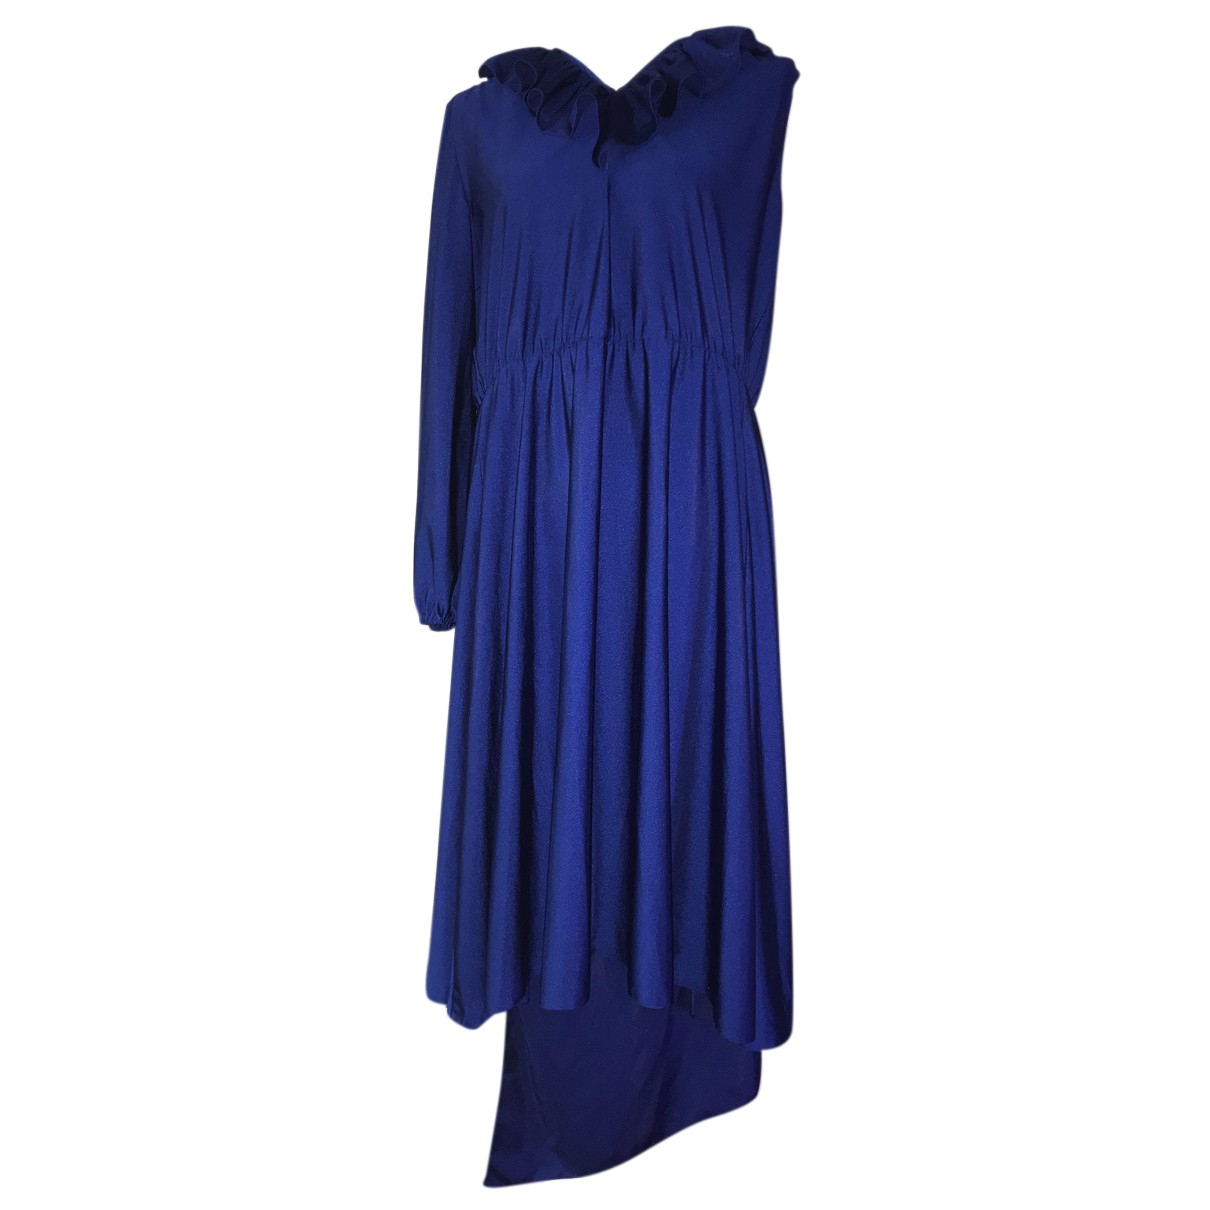 Vetements N Blue dress for Women S International